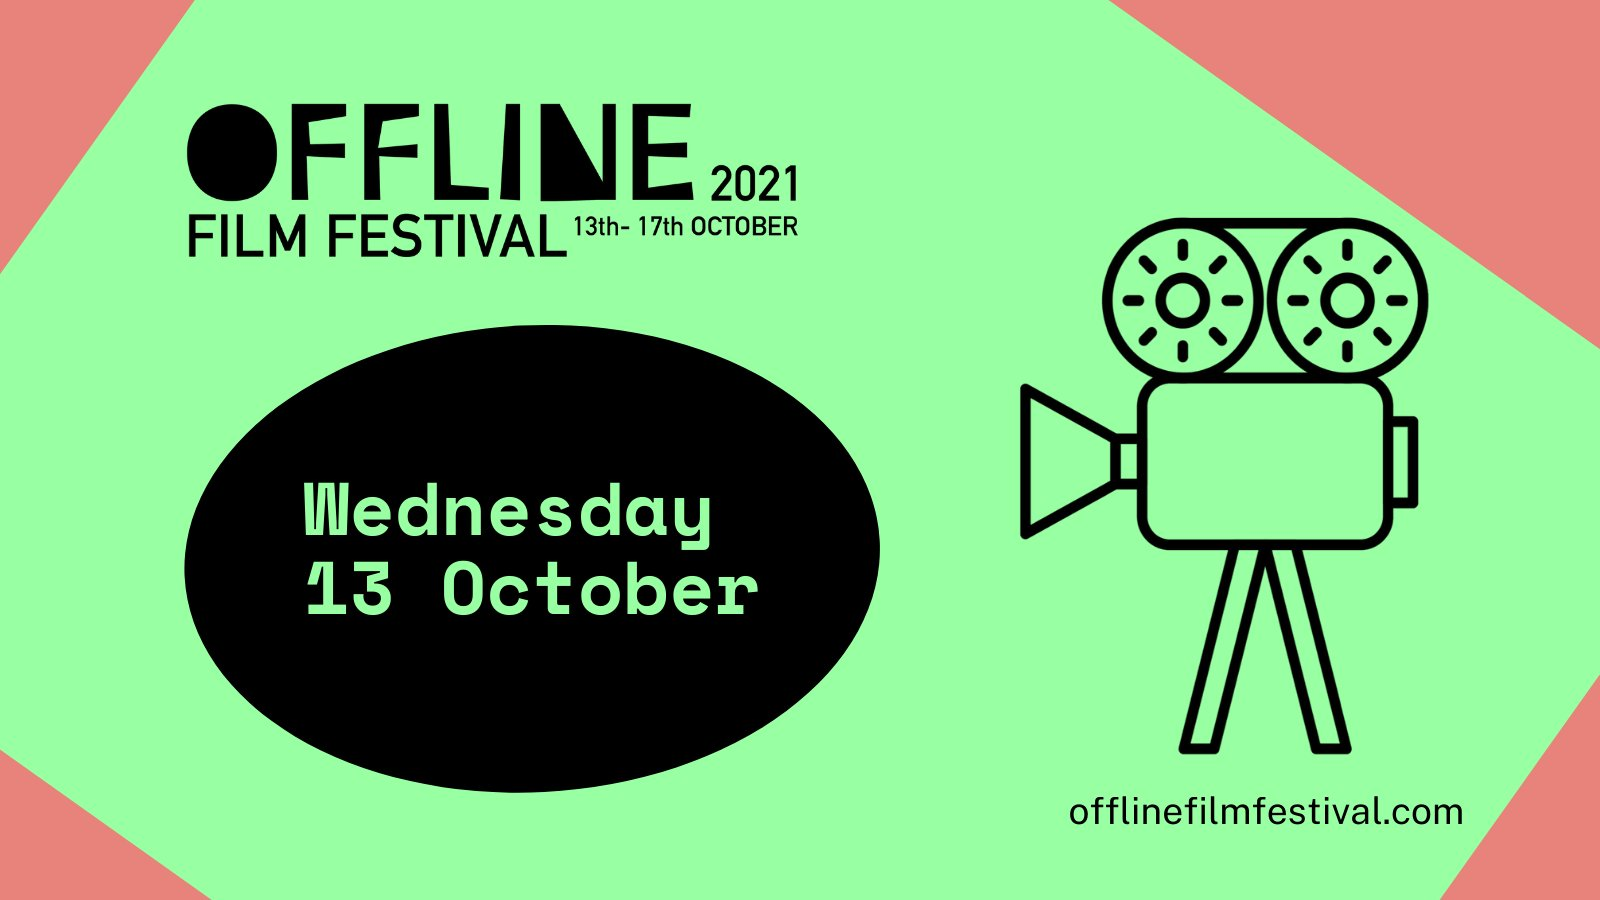 Offline Film Festival Offaly